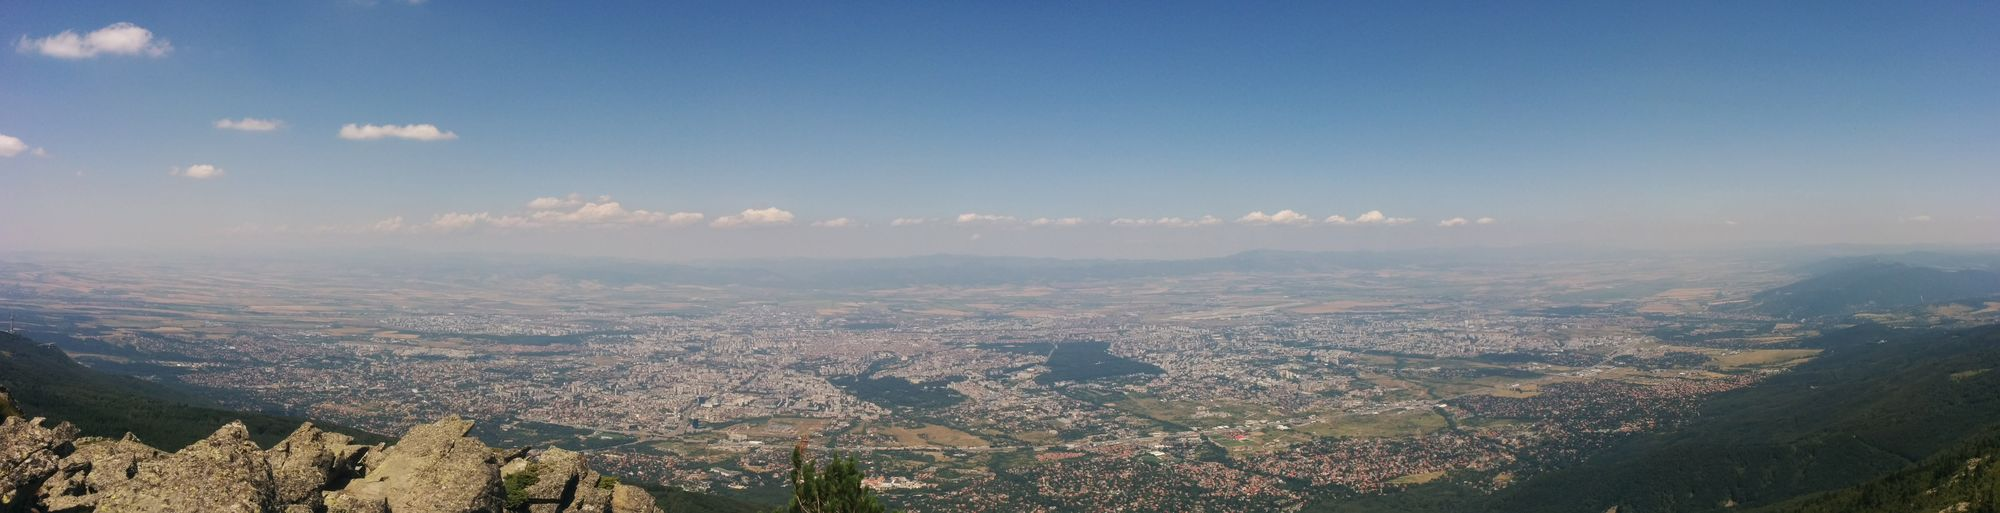 Sofia, Bulgaria Vryh Kamen Del